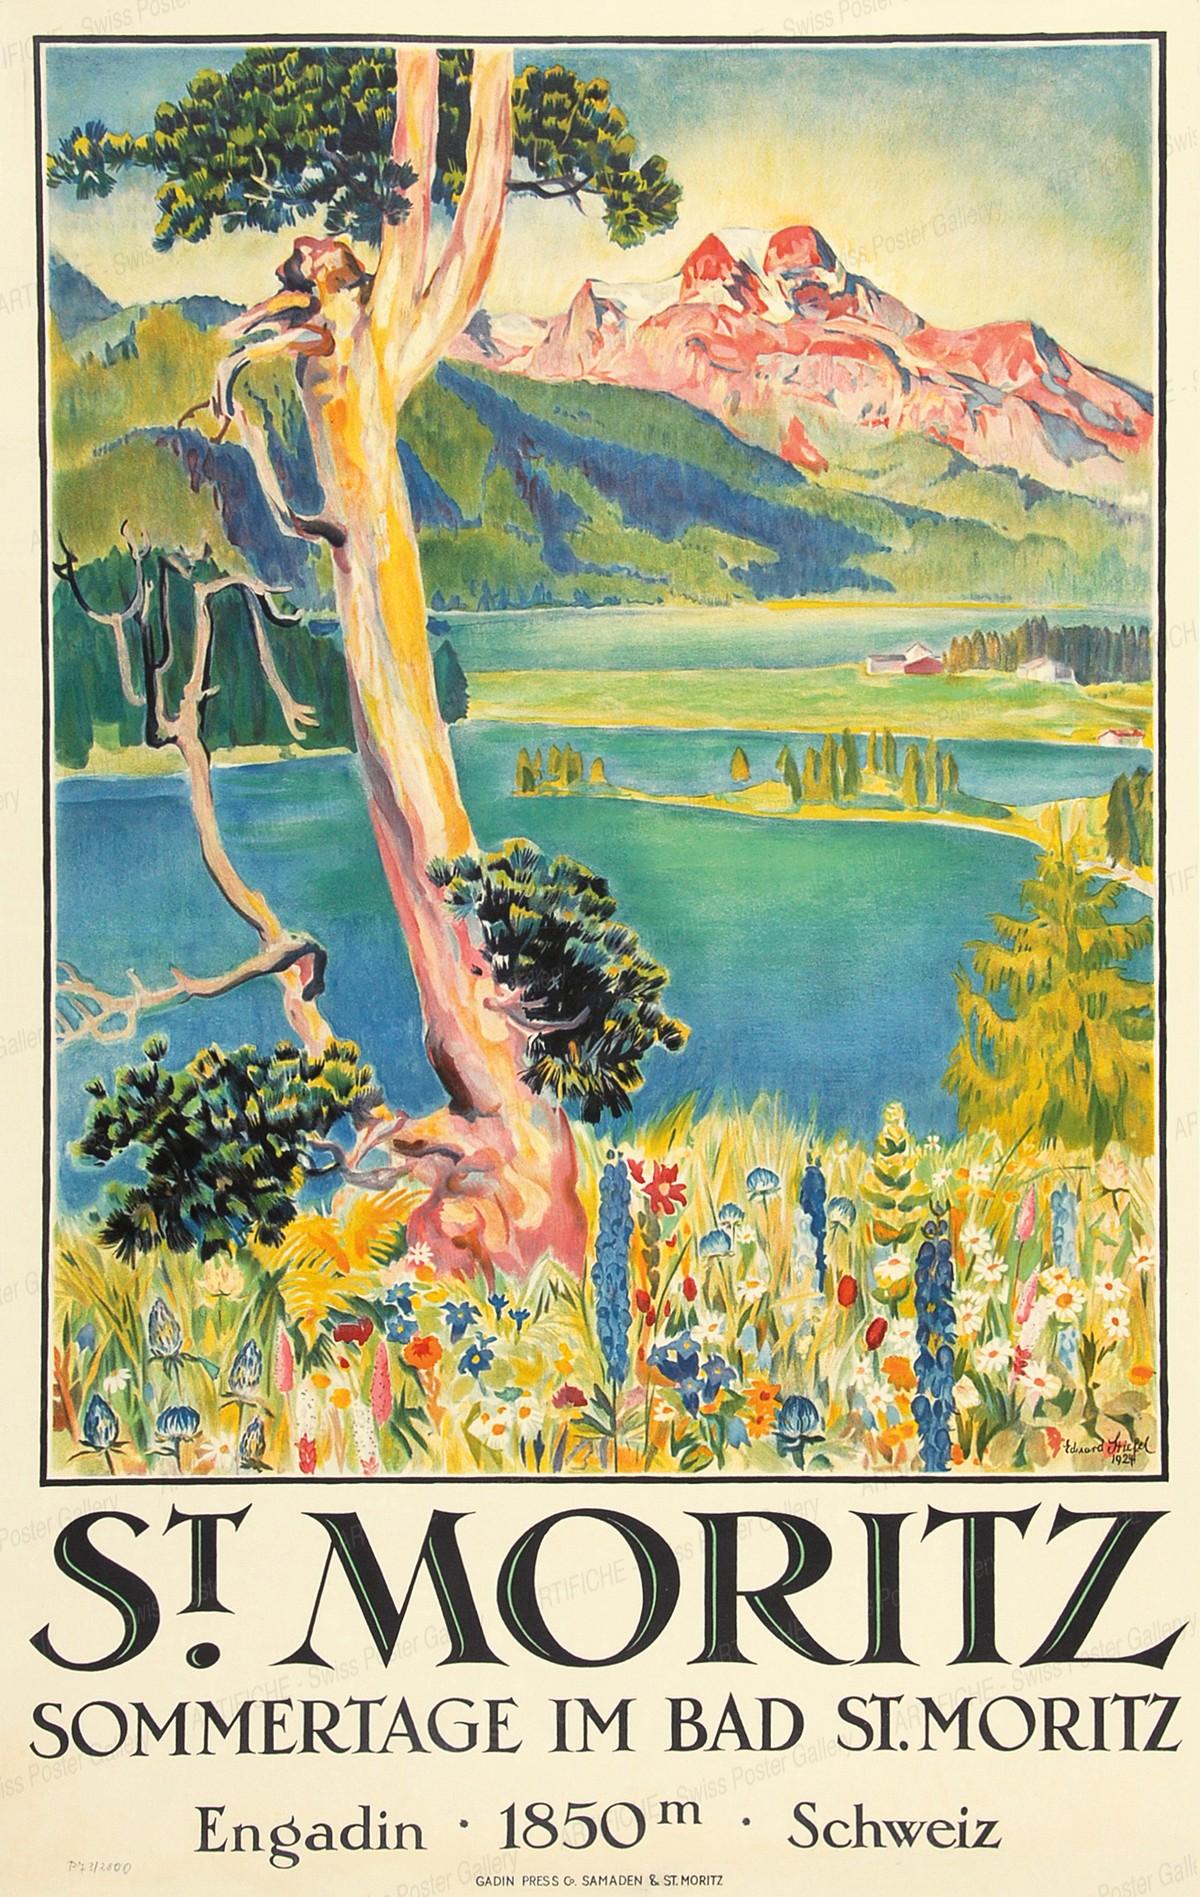 ST. MORITZ – SOMMERTAGE IM BAD ST. MORITZ, Edouard Stiefel